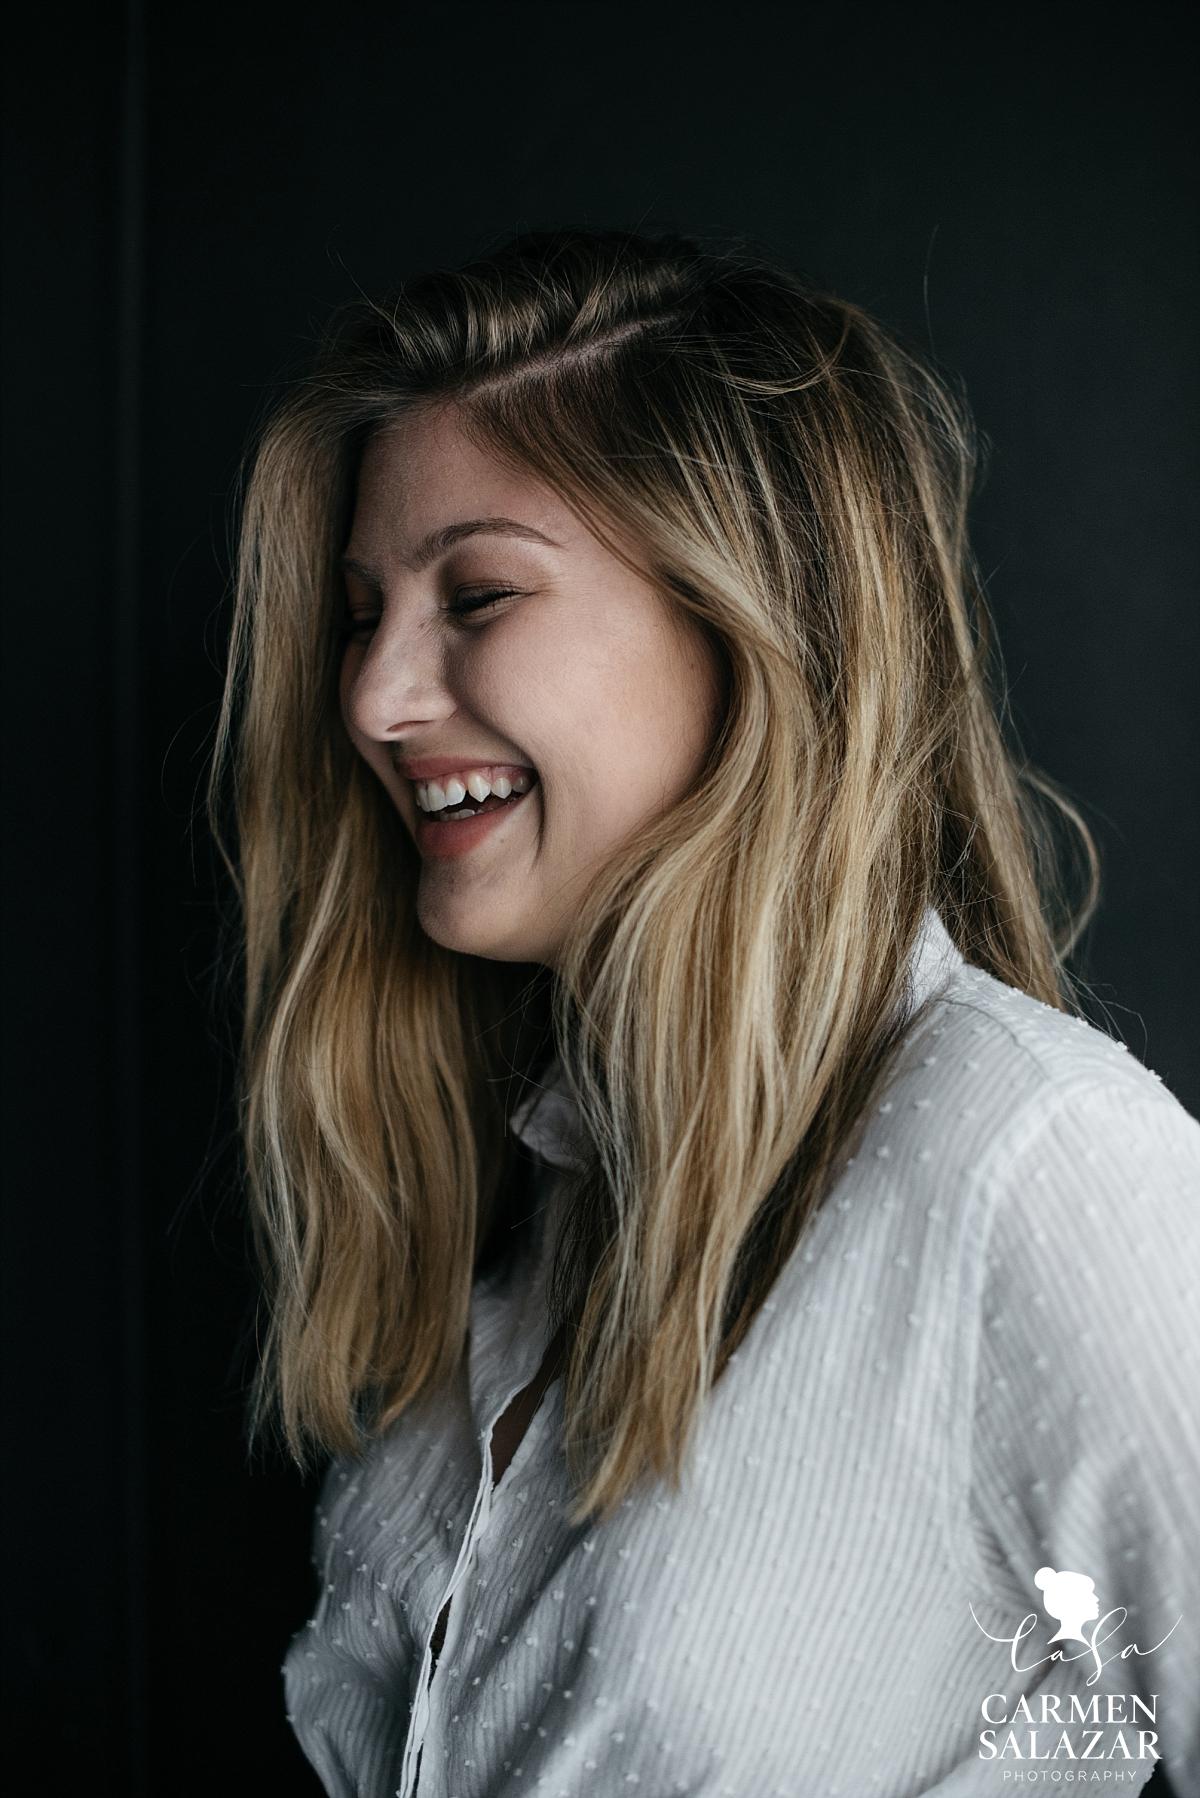 Playful teen modeling portraits - Carmen Salazar